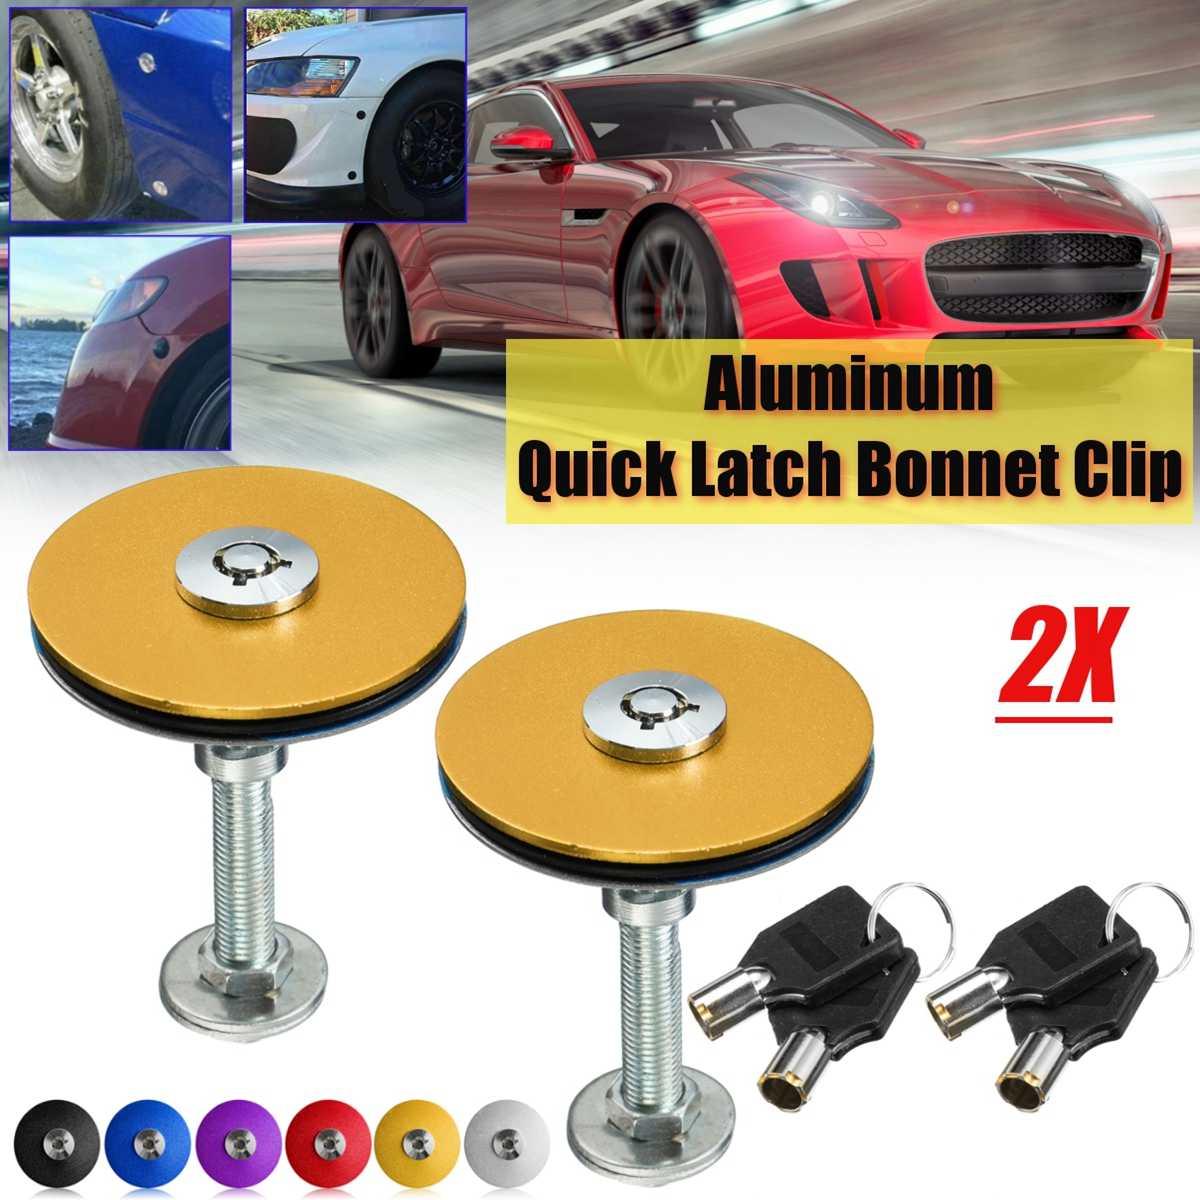 2 pcs 4 pcs Universal Car Quick Latches Bonnet with Key Hood Lock Clip Set Engine Bonnet Flush Plus With Key Hood Pin Latch Kit